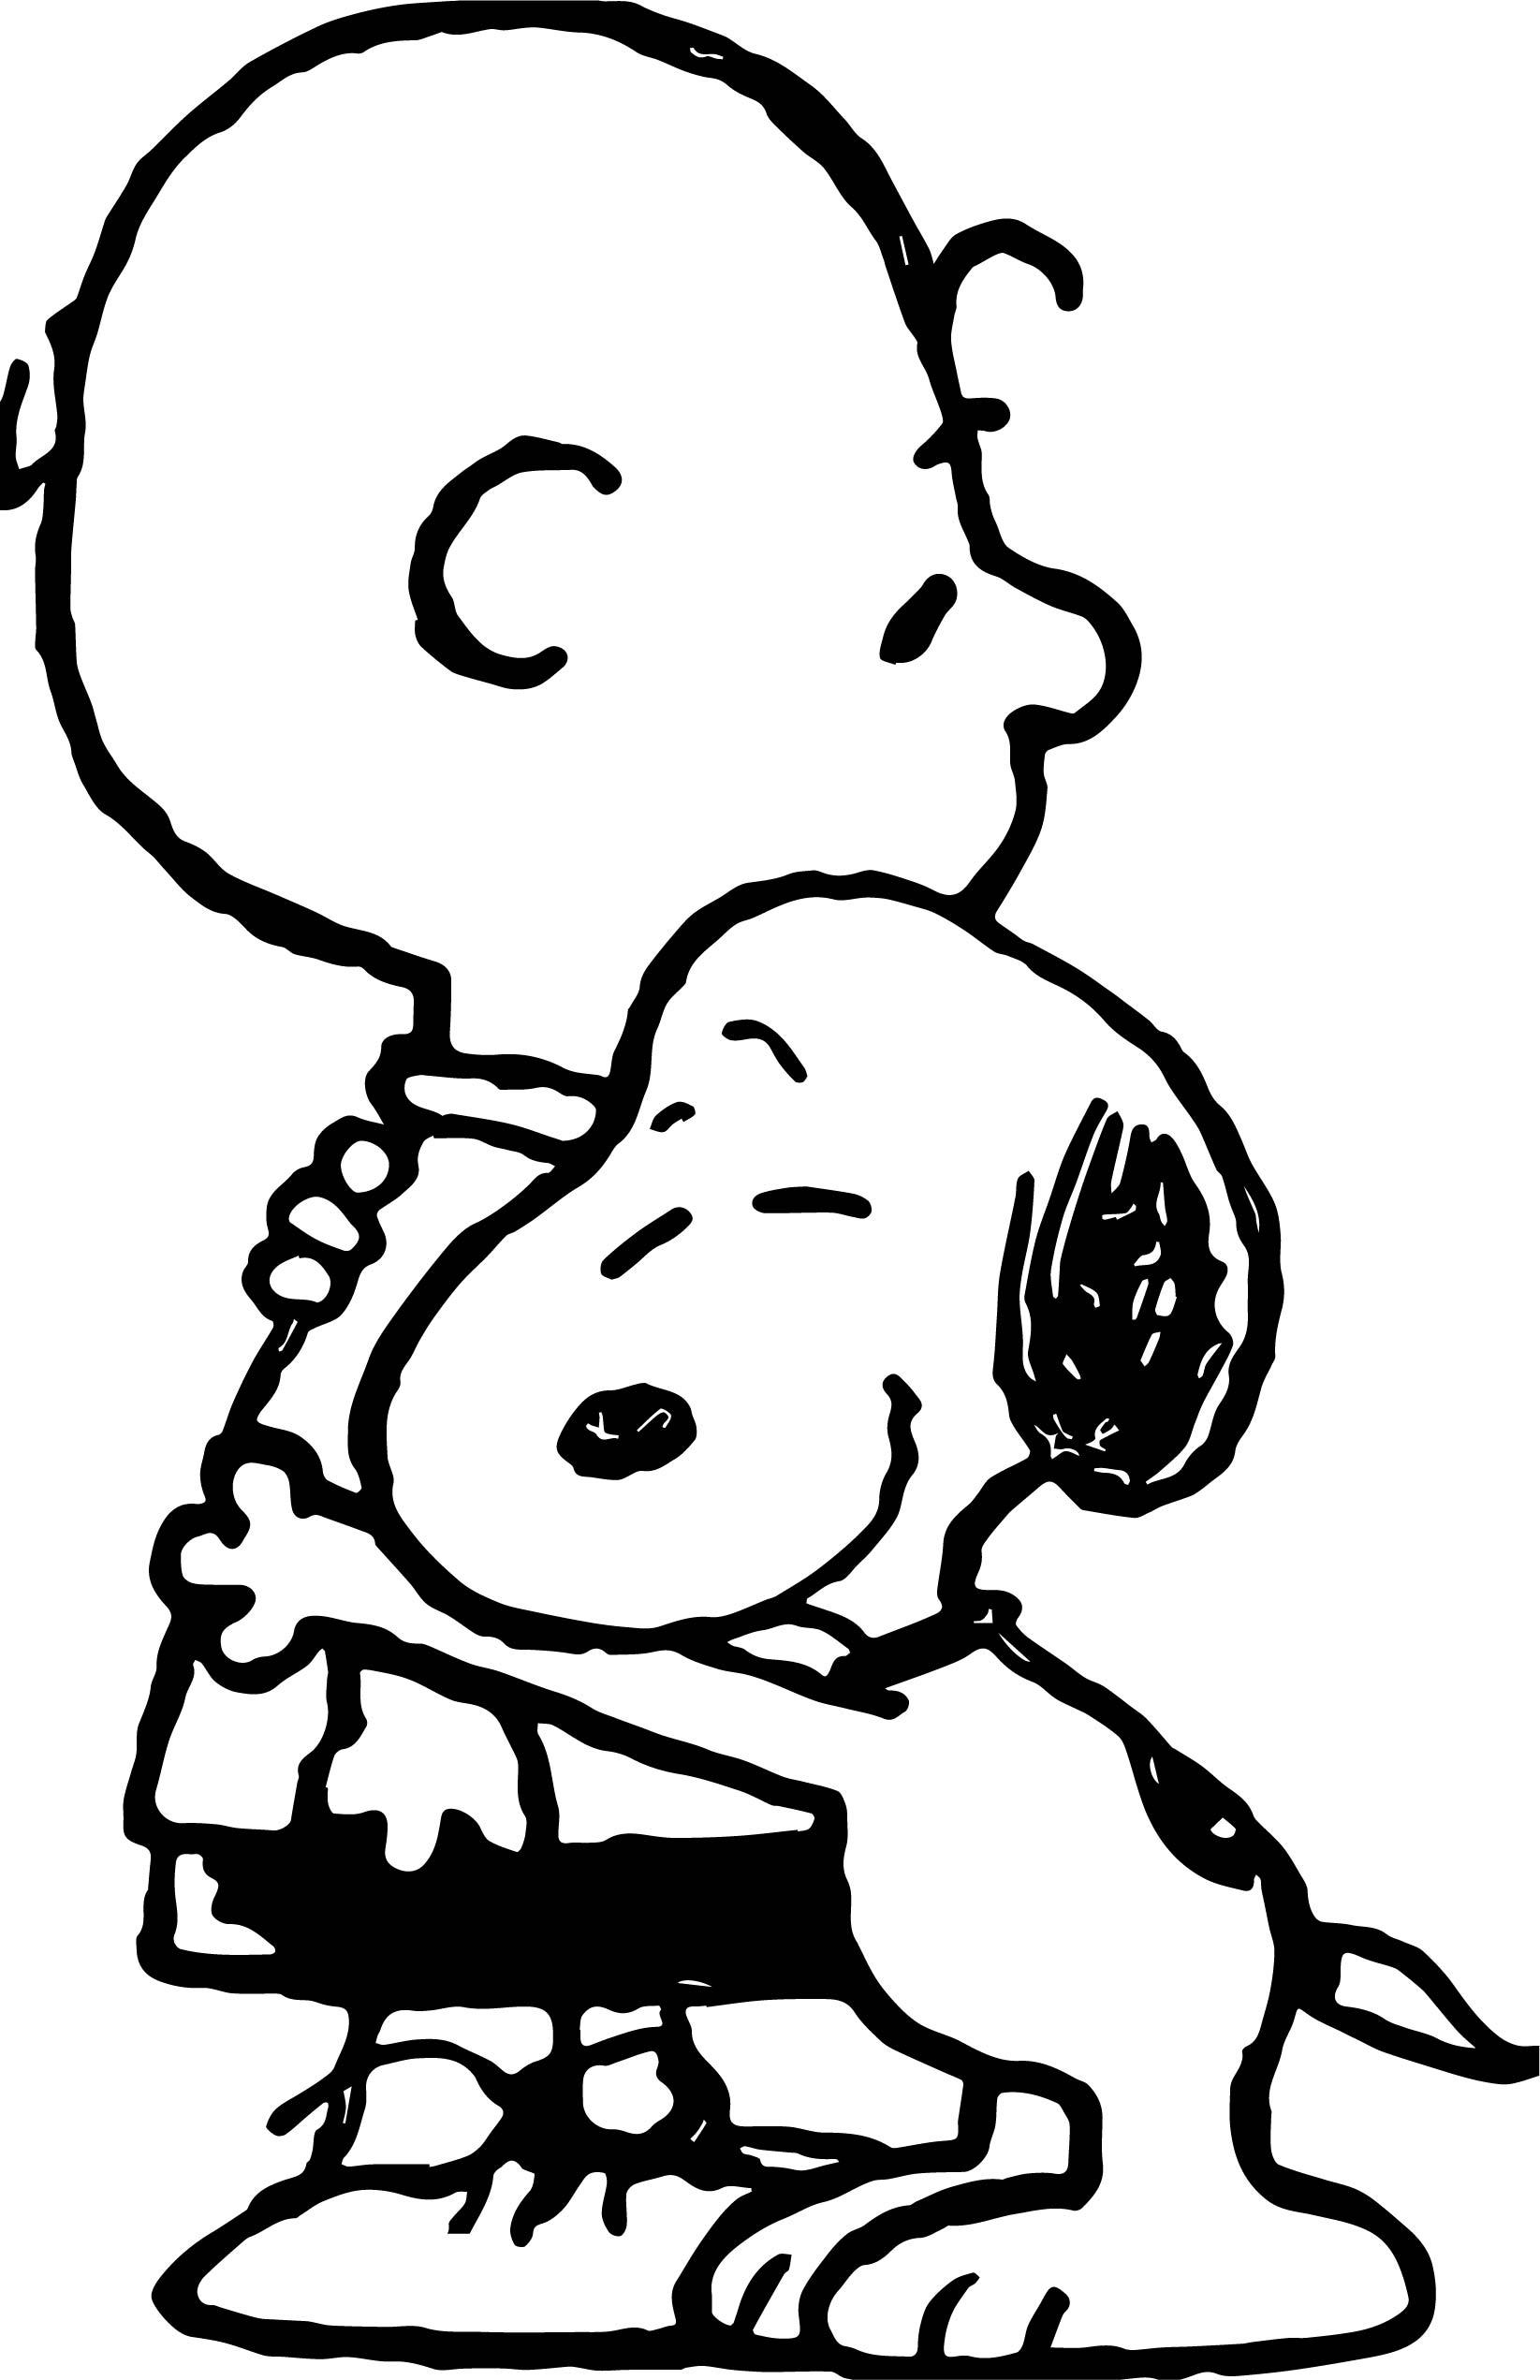 Snoopy Hug Coloring Page | Wecoloringpage.com